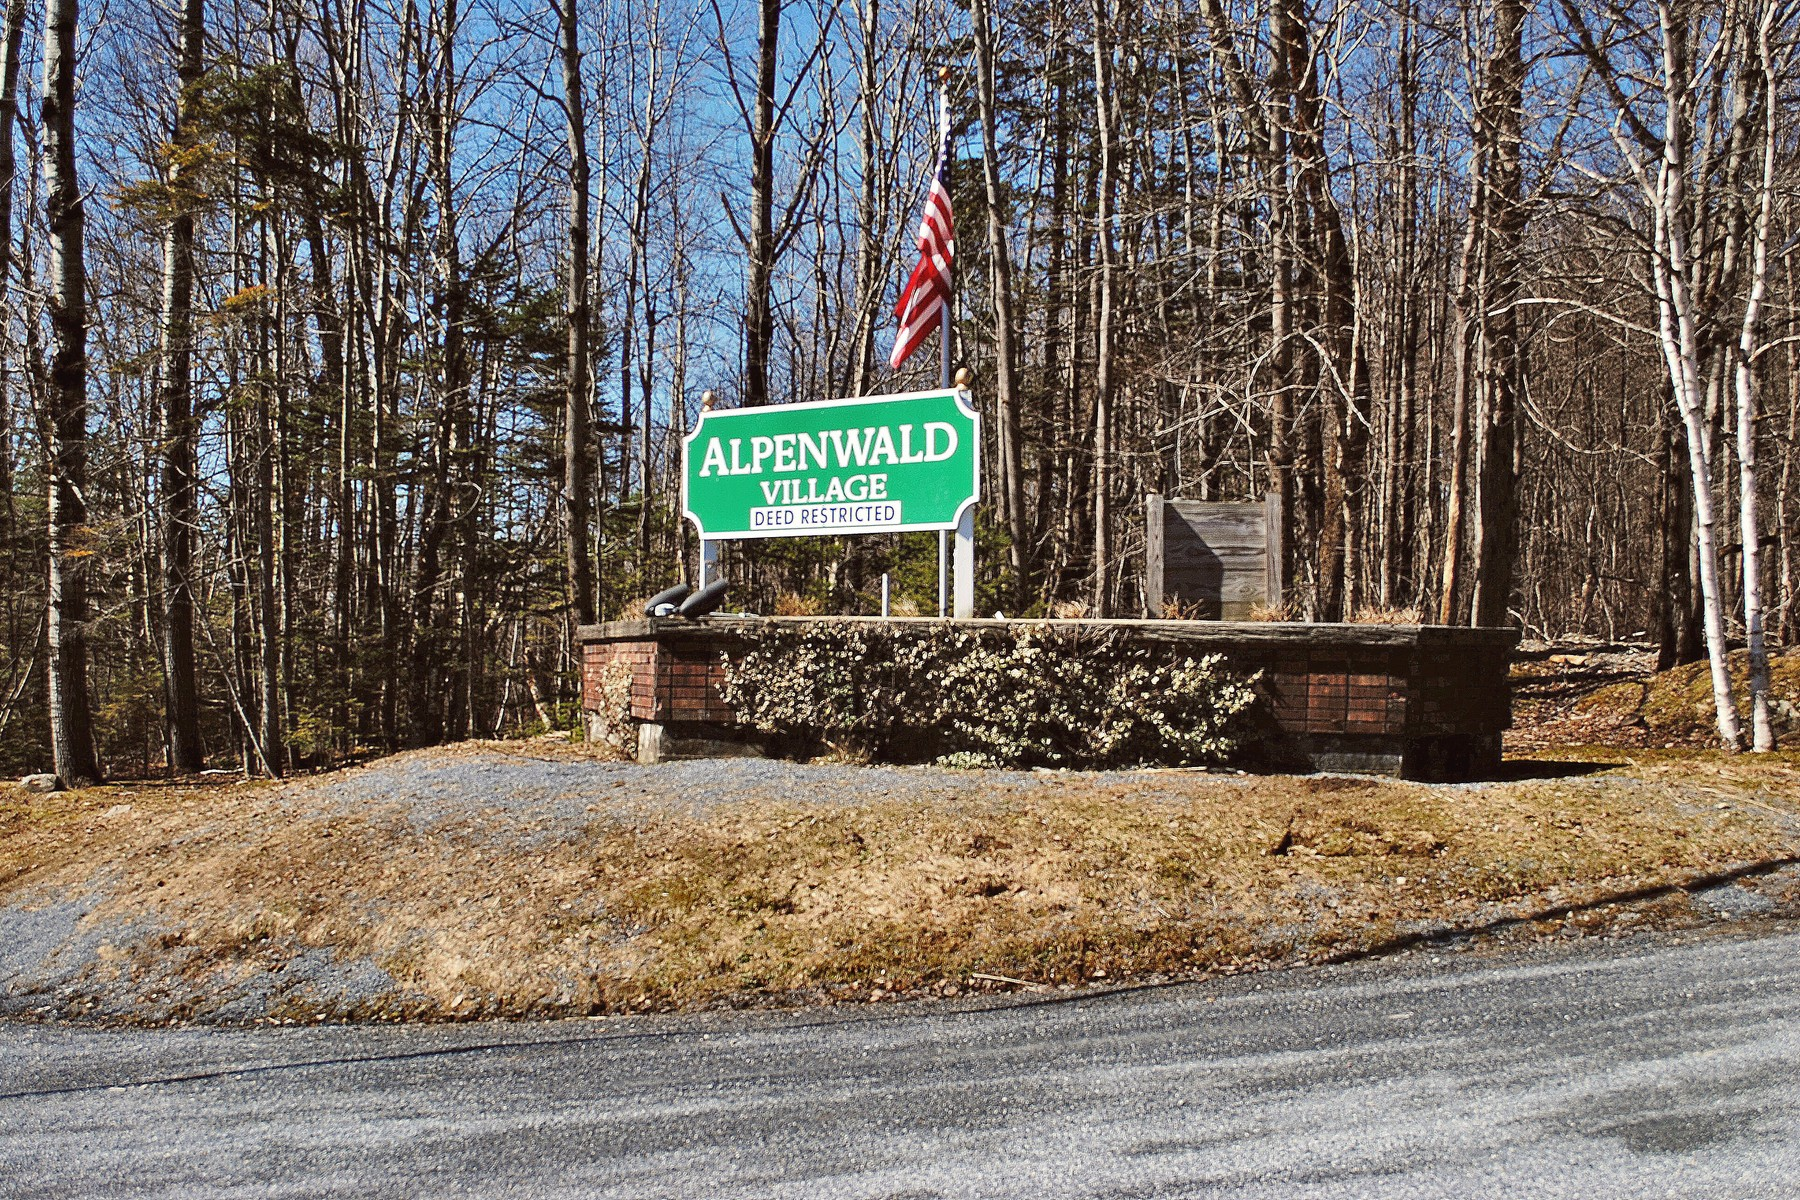 Land for Sale at 167 Oberdorf, Readsboro 167 Oberdorf Readsboro, Vermont 05350 United States